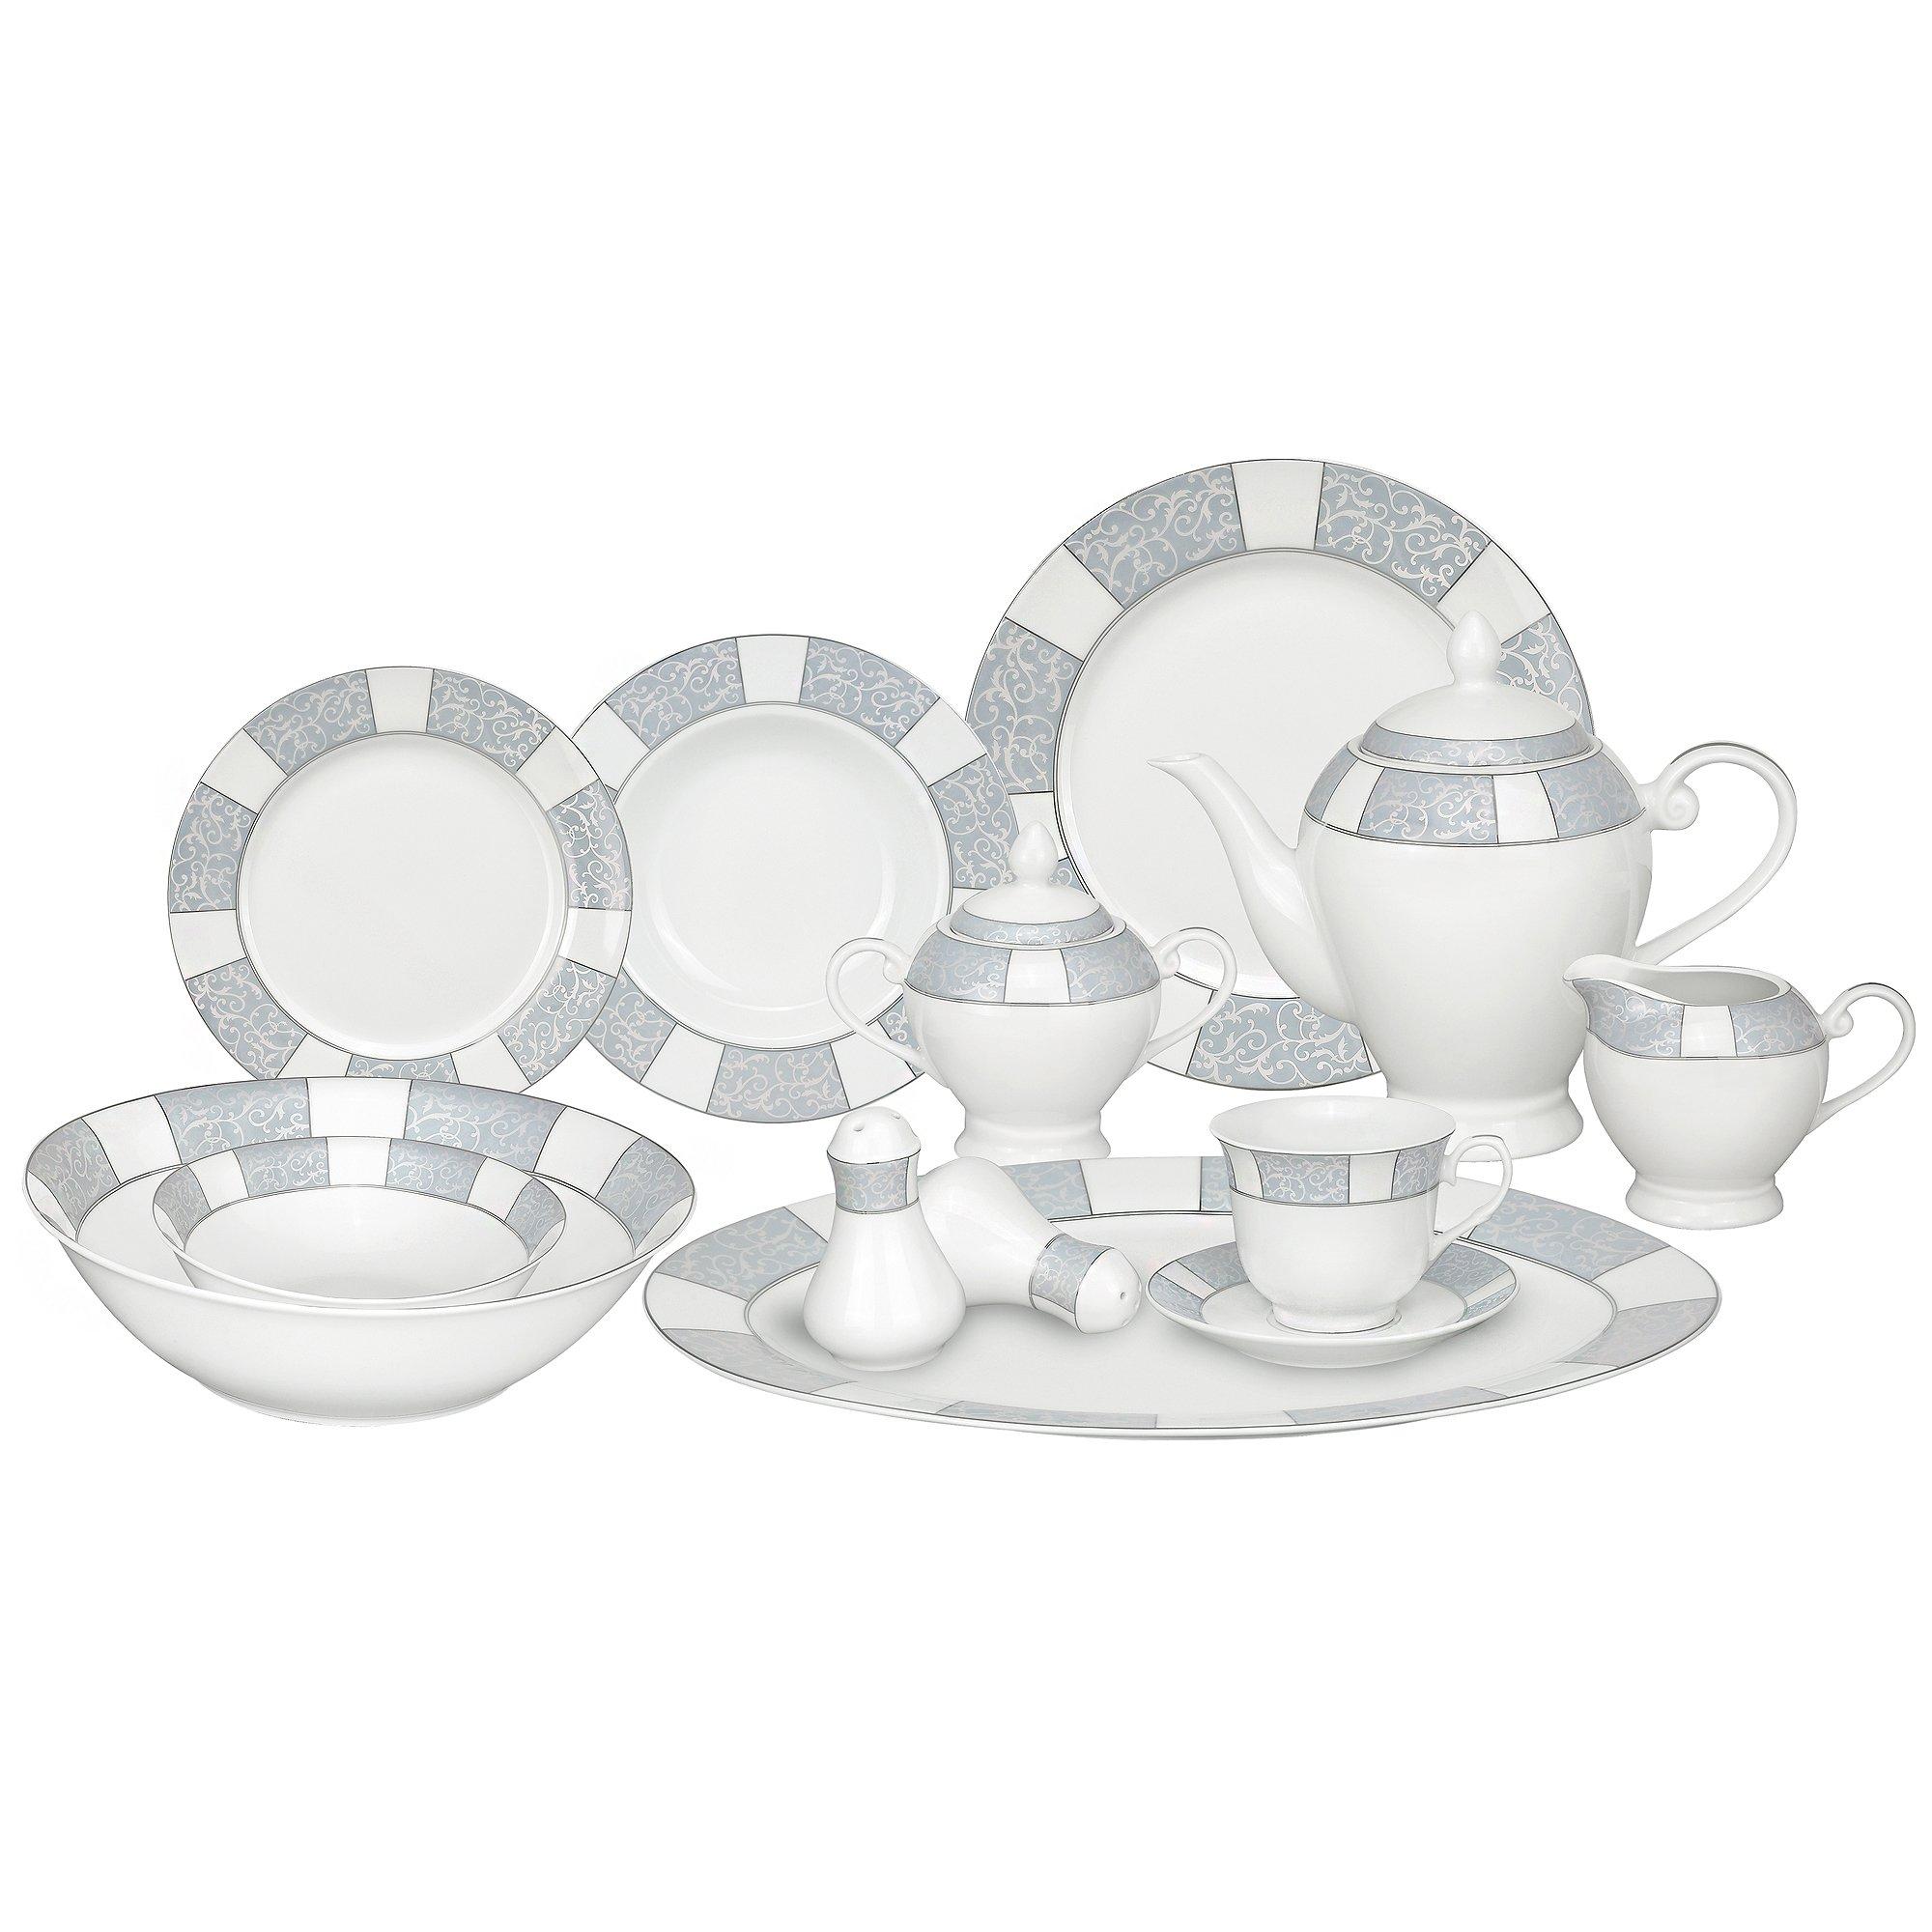 Lorren Home Trends 57-Piece Porcelain Dinnerware Set, Domus, Service for 8